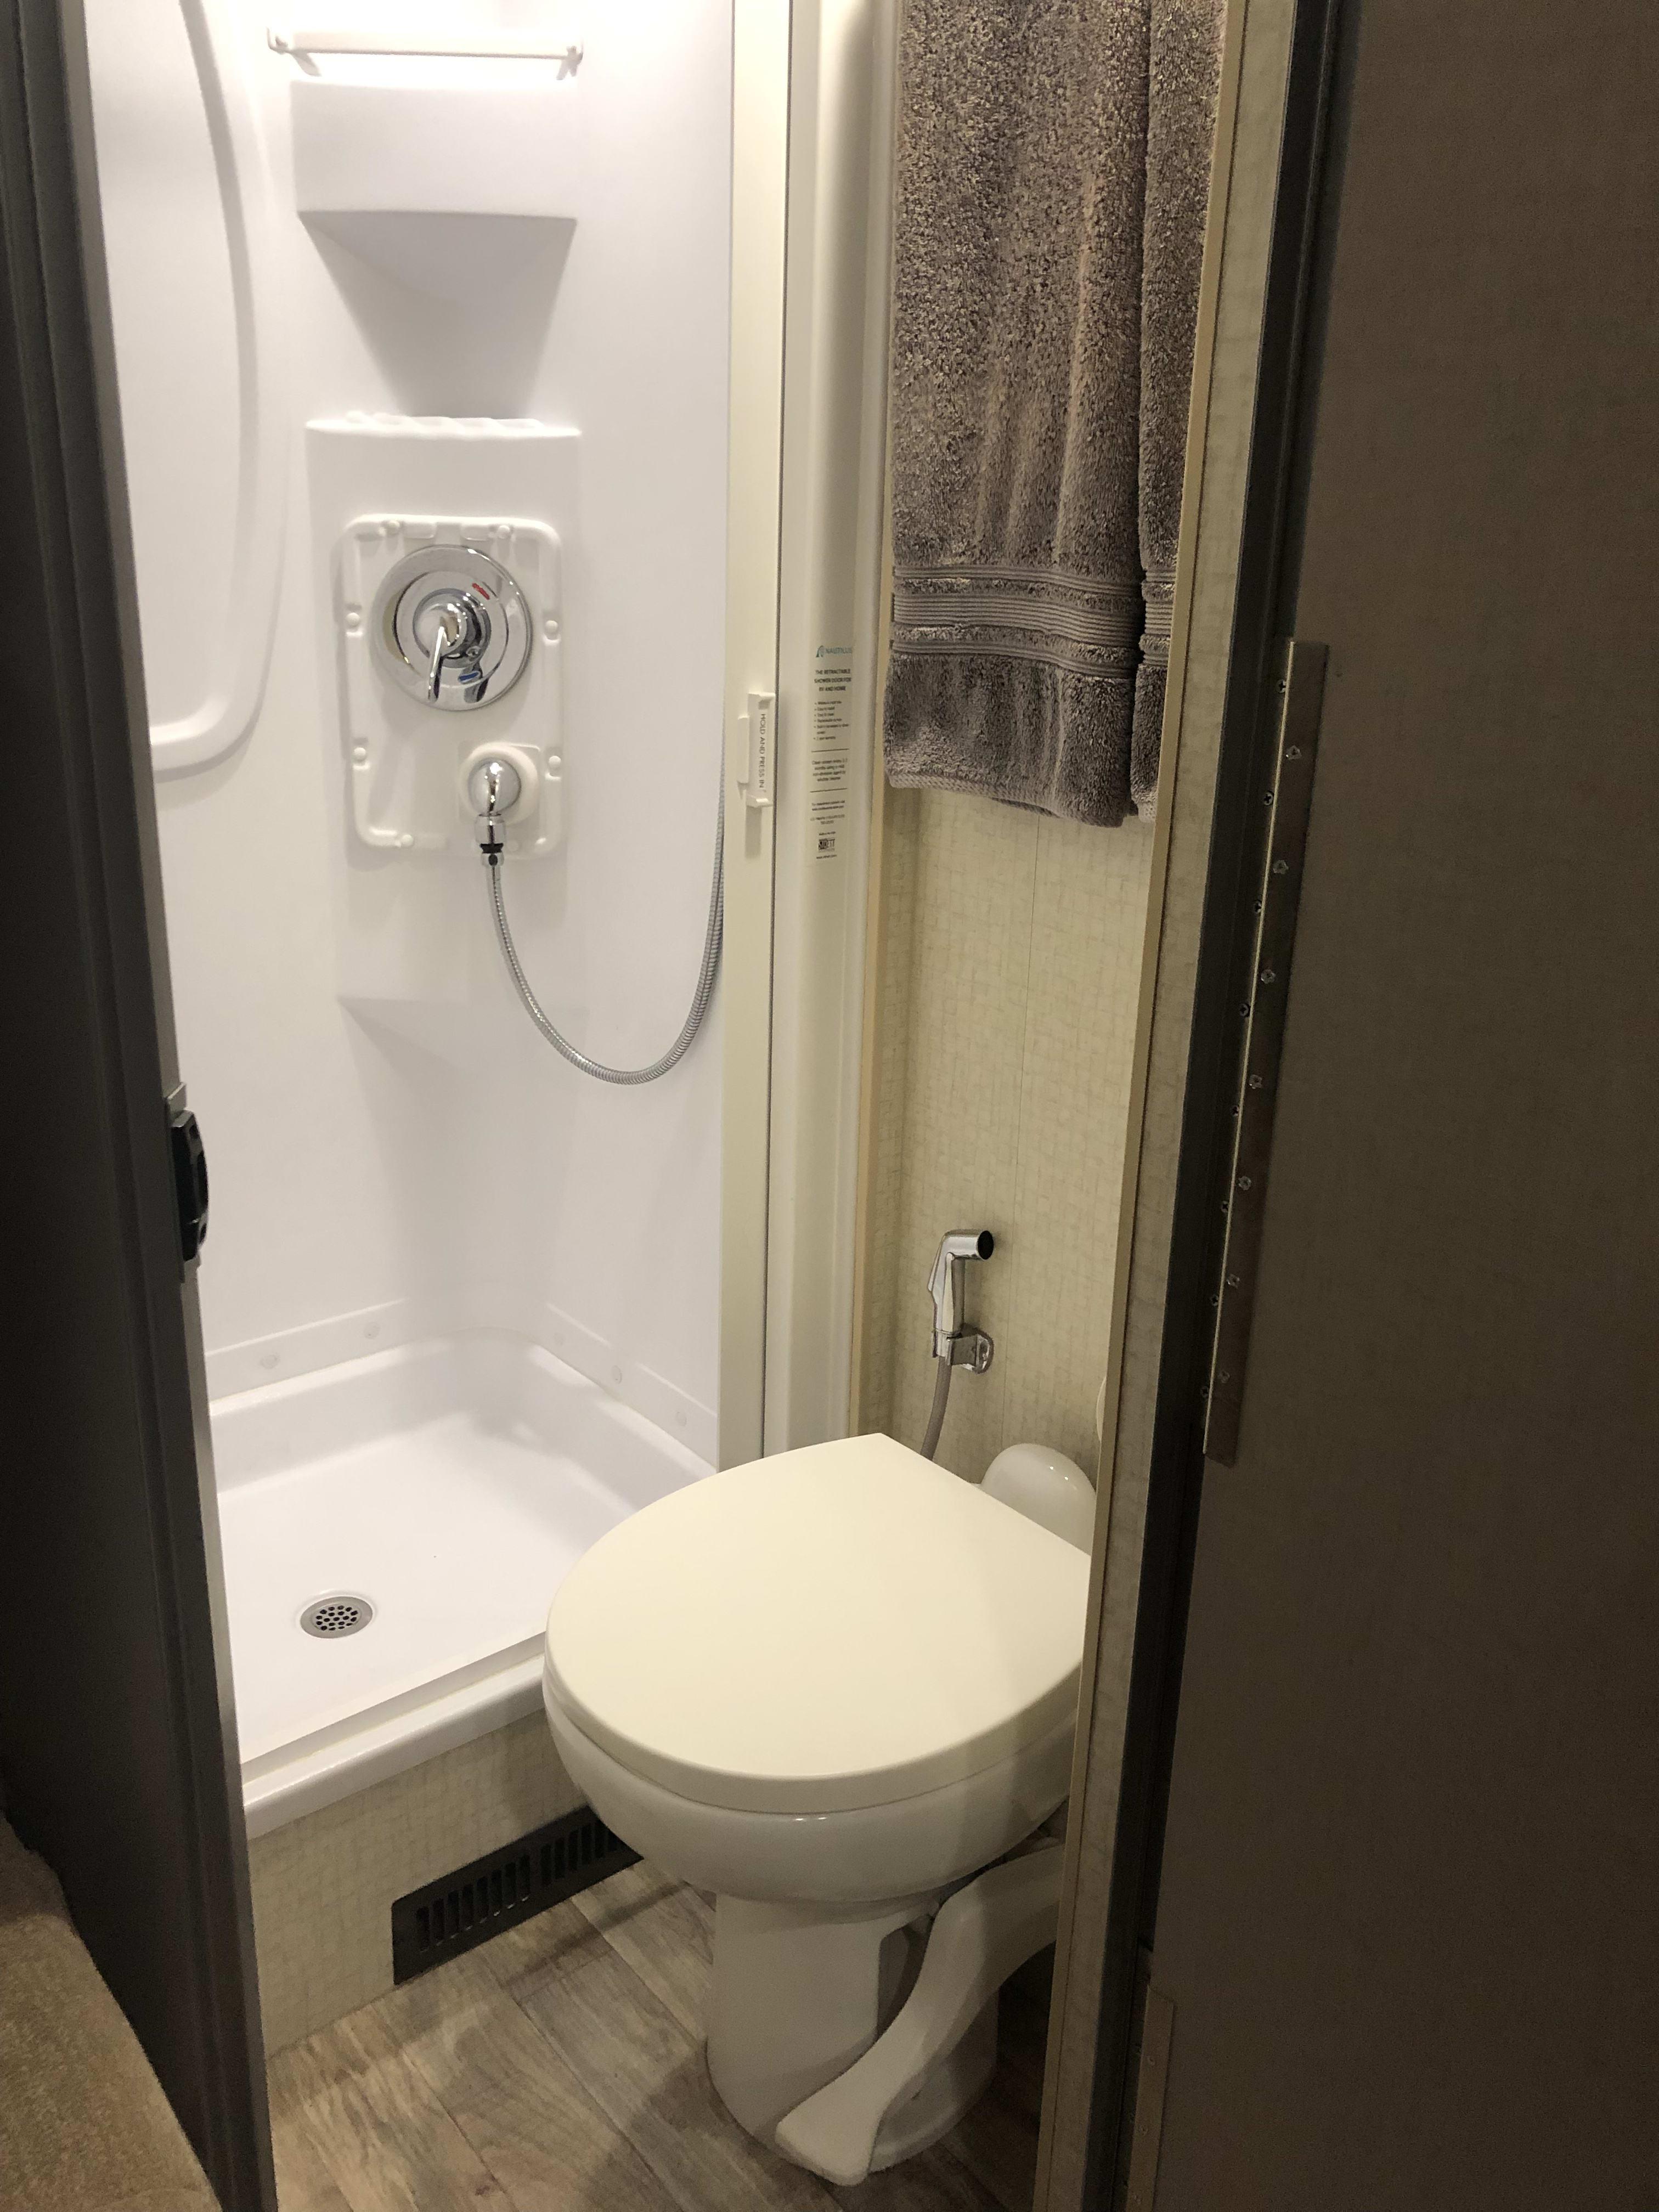 Separate toilet and shower. Winnebago View 2017